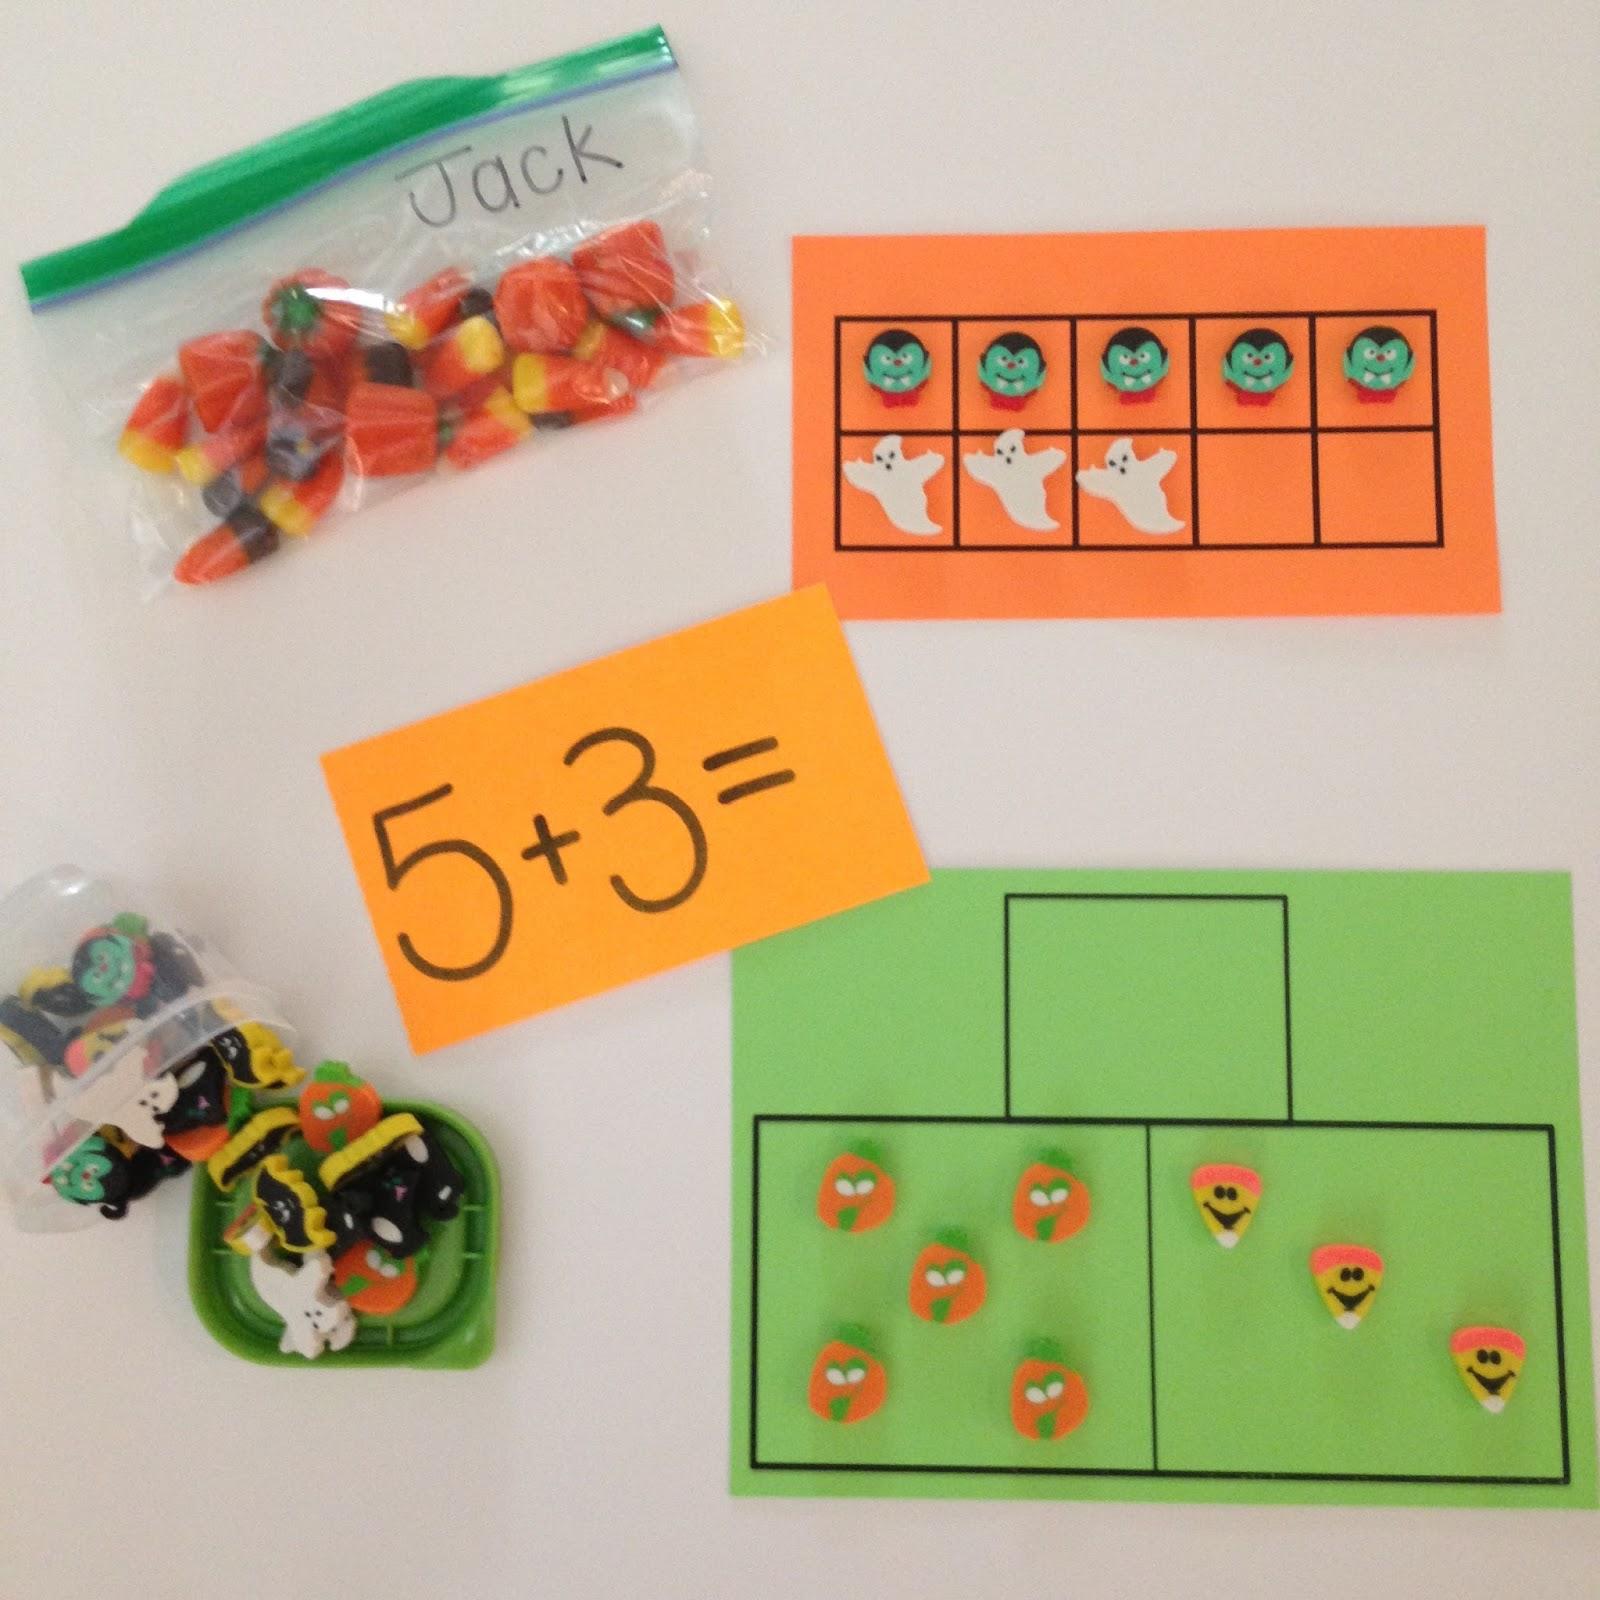 Houghton Mifflin Math Kindergarten Worksheets houghton mifflin – Houghton Mifflin Math Grade 5 Worksheets